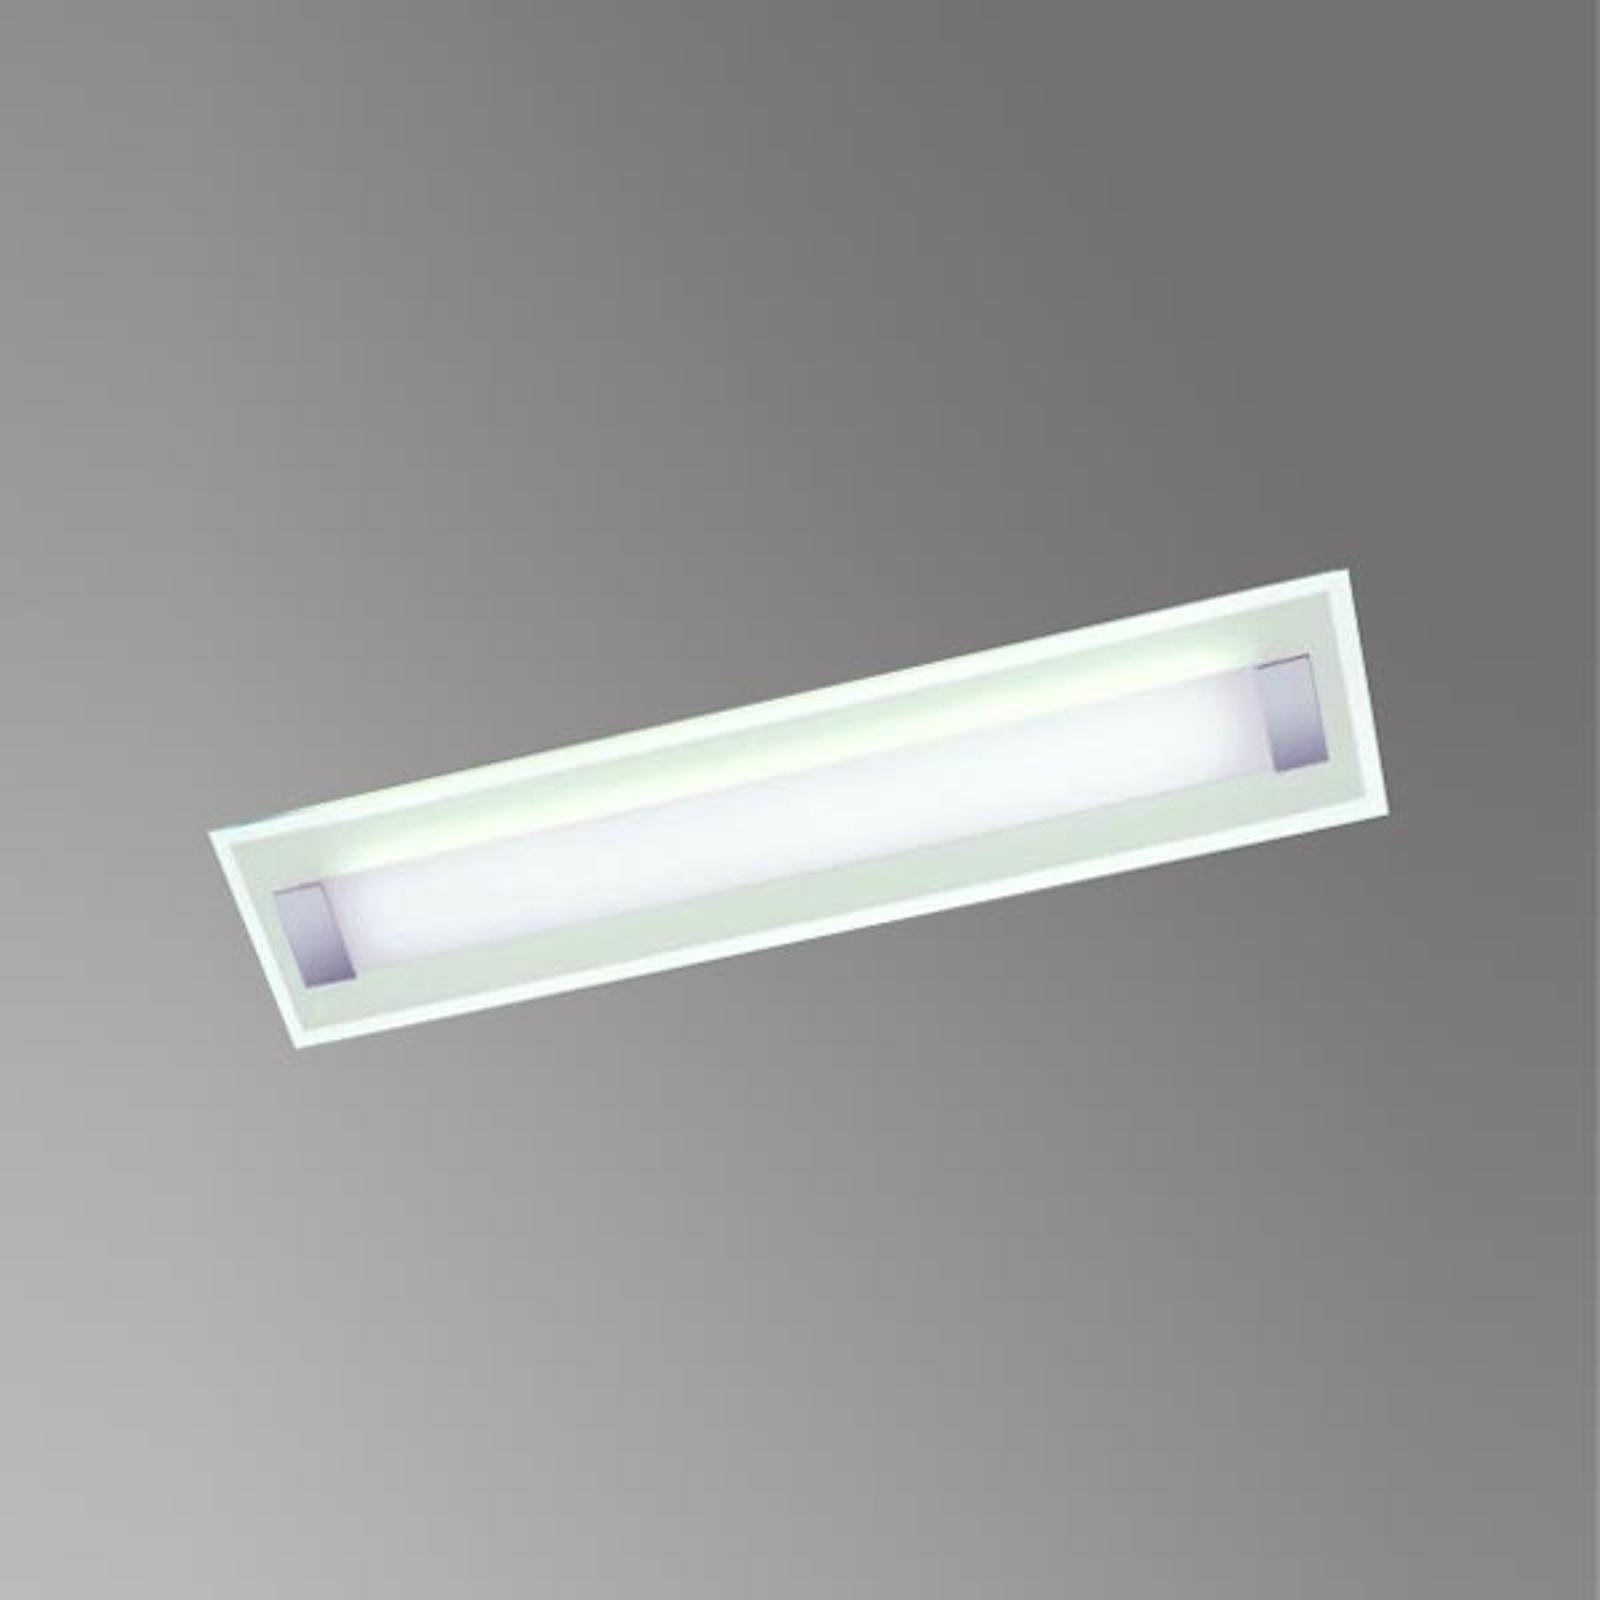 Lampa sufitowa LED XENA T z pilotem